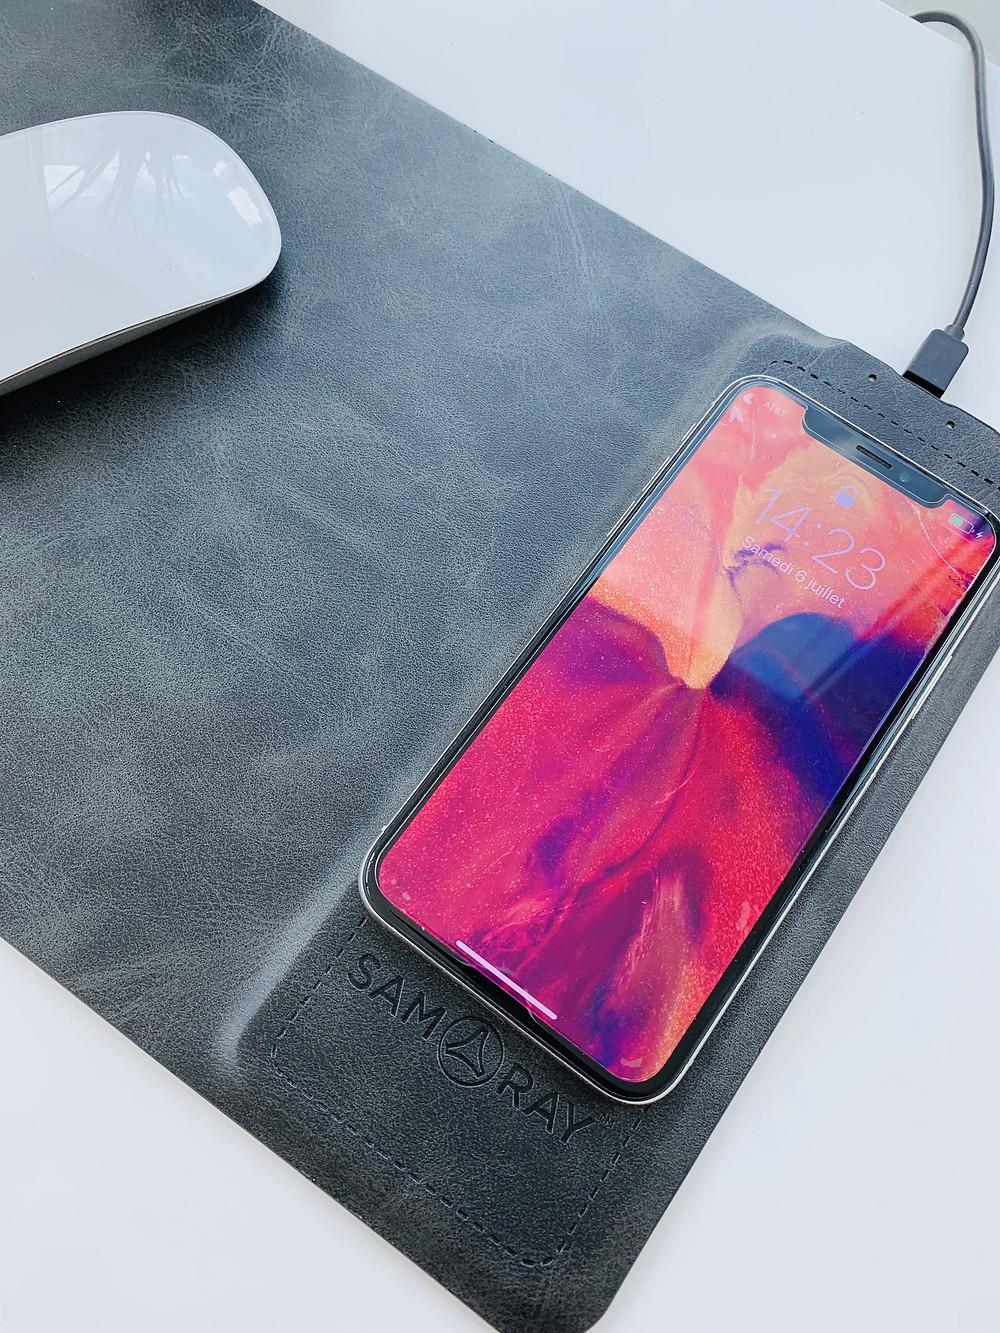 2合一手機充電器 滑鼠墊 Charger MousePad